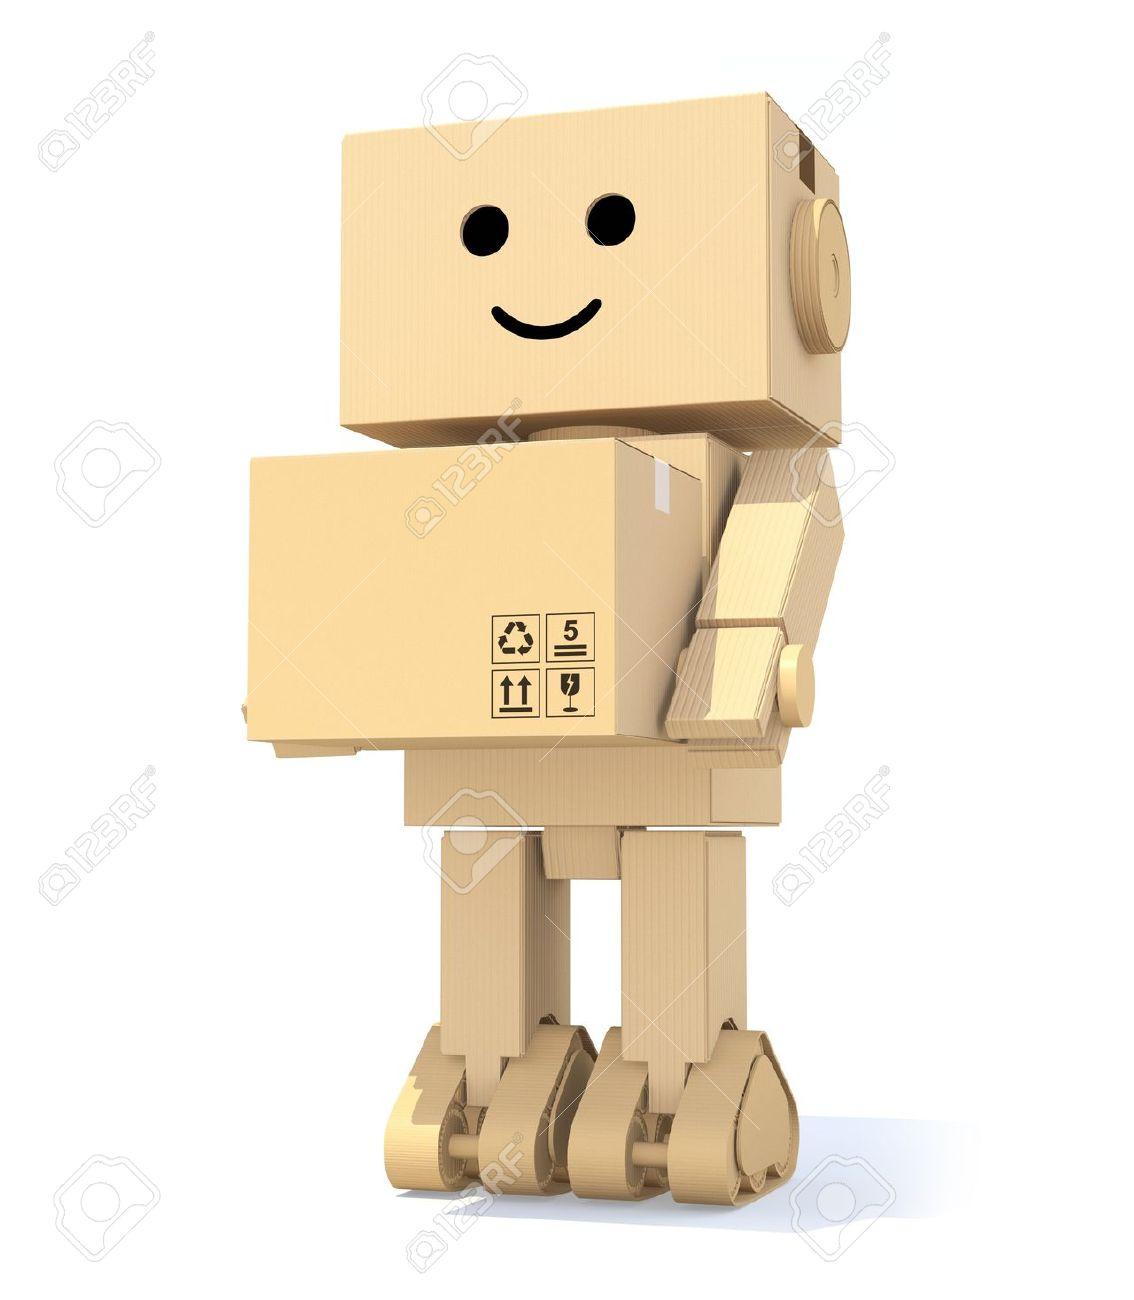 Cardboard robot plans